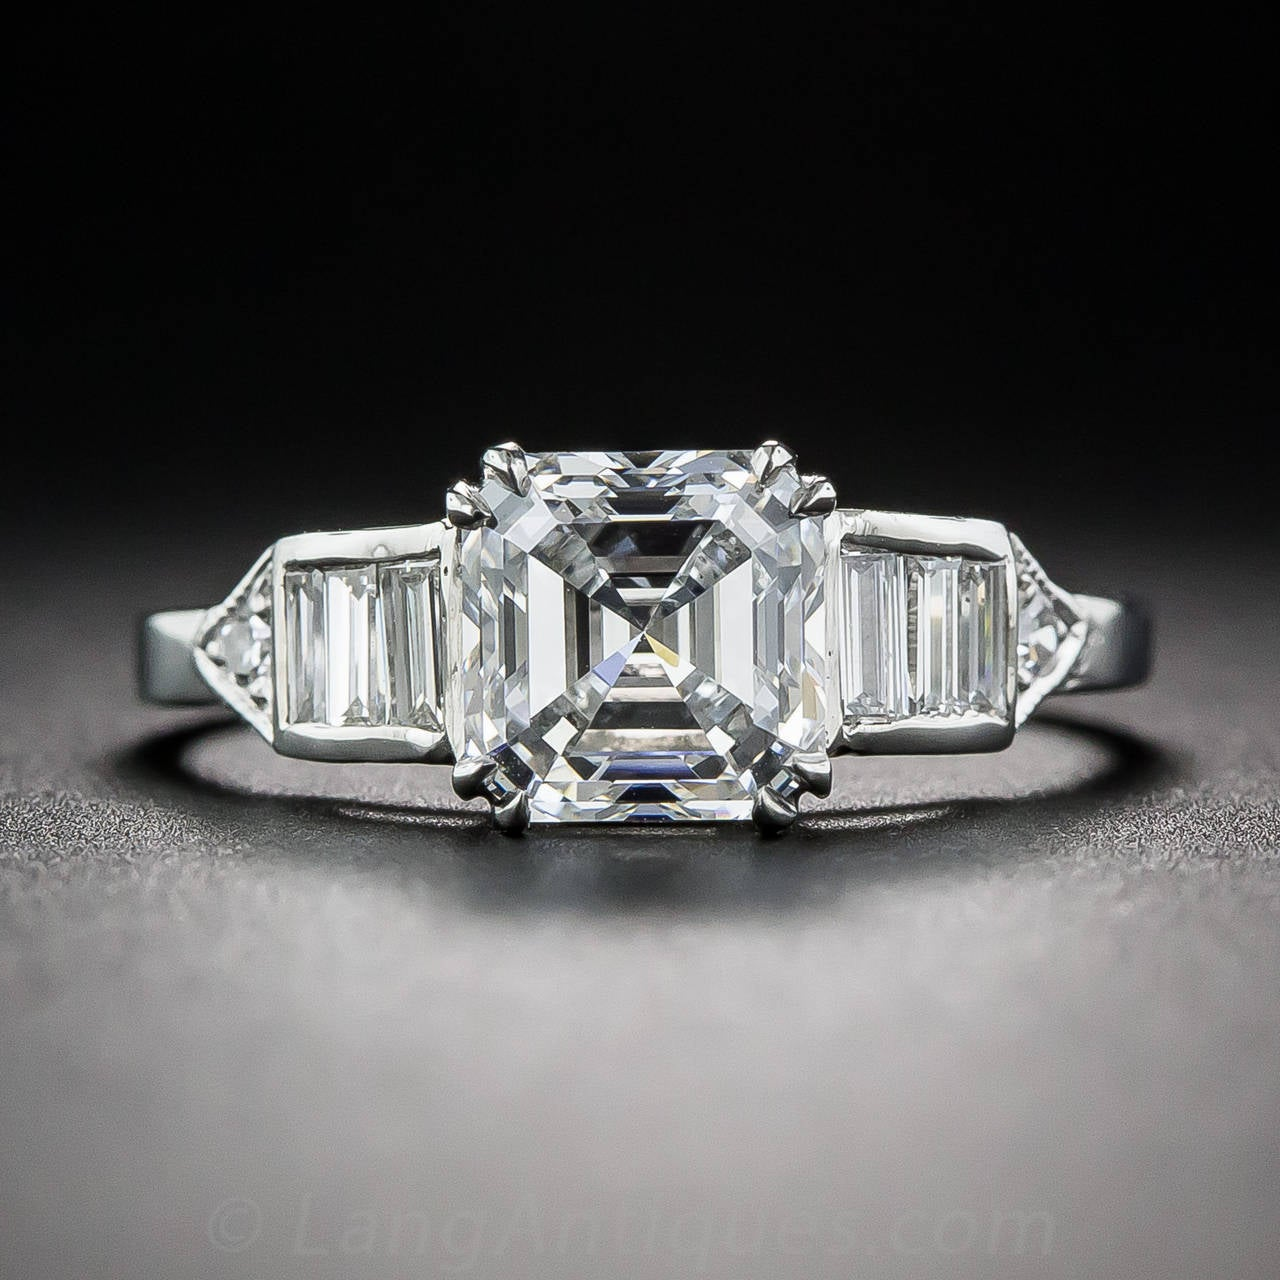 1 50 Carat GIA D VS1 Asscher Cut Diamond Platinum Ring at 1stdibs